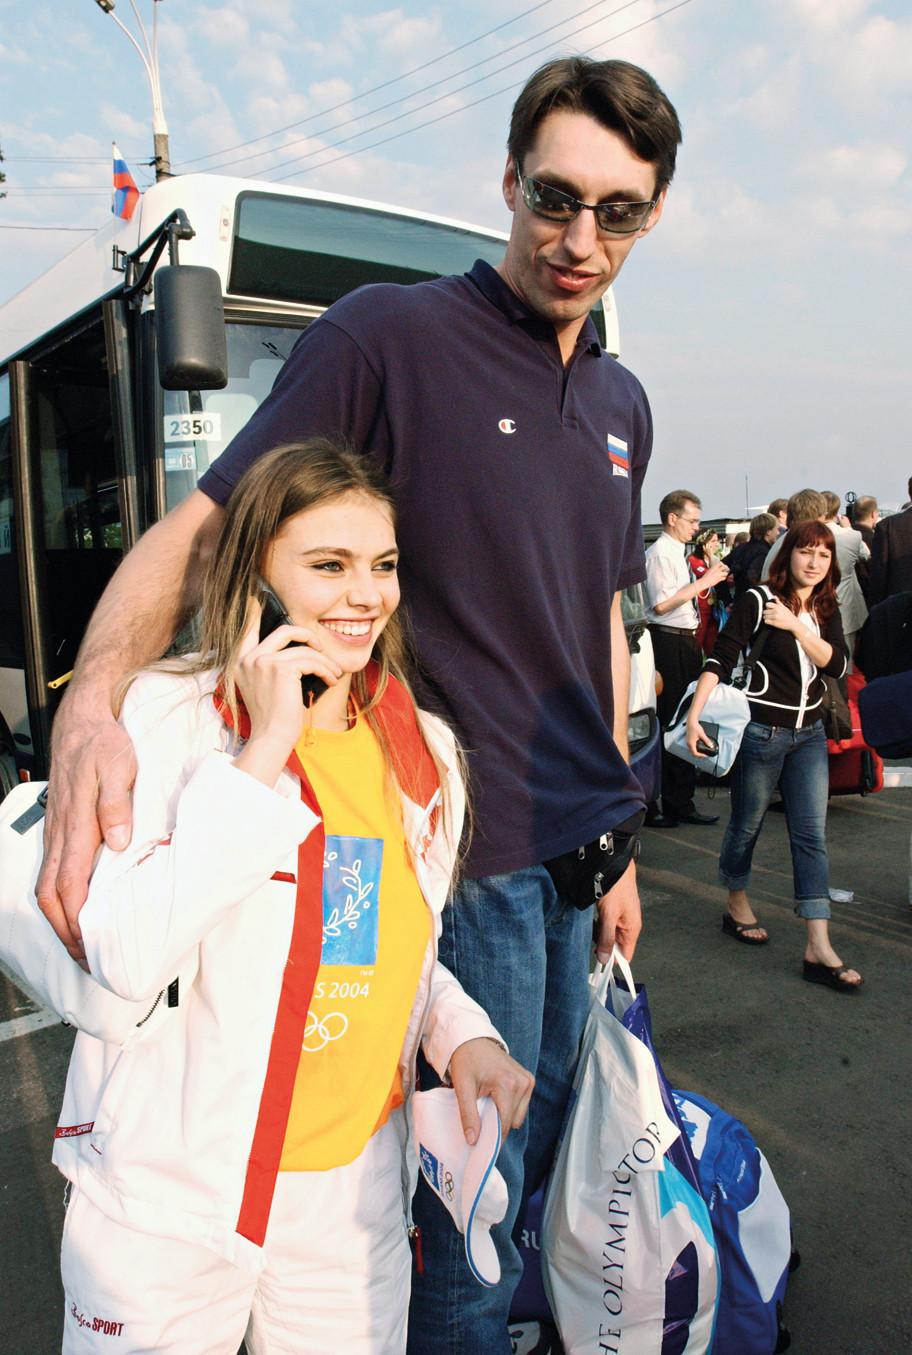 Станислав Динейкин и Алина Кабаева